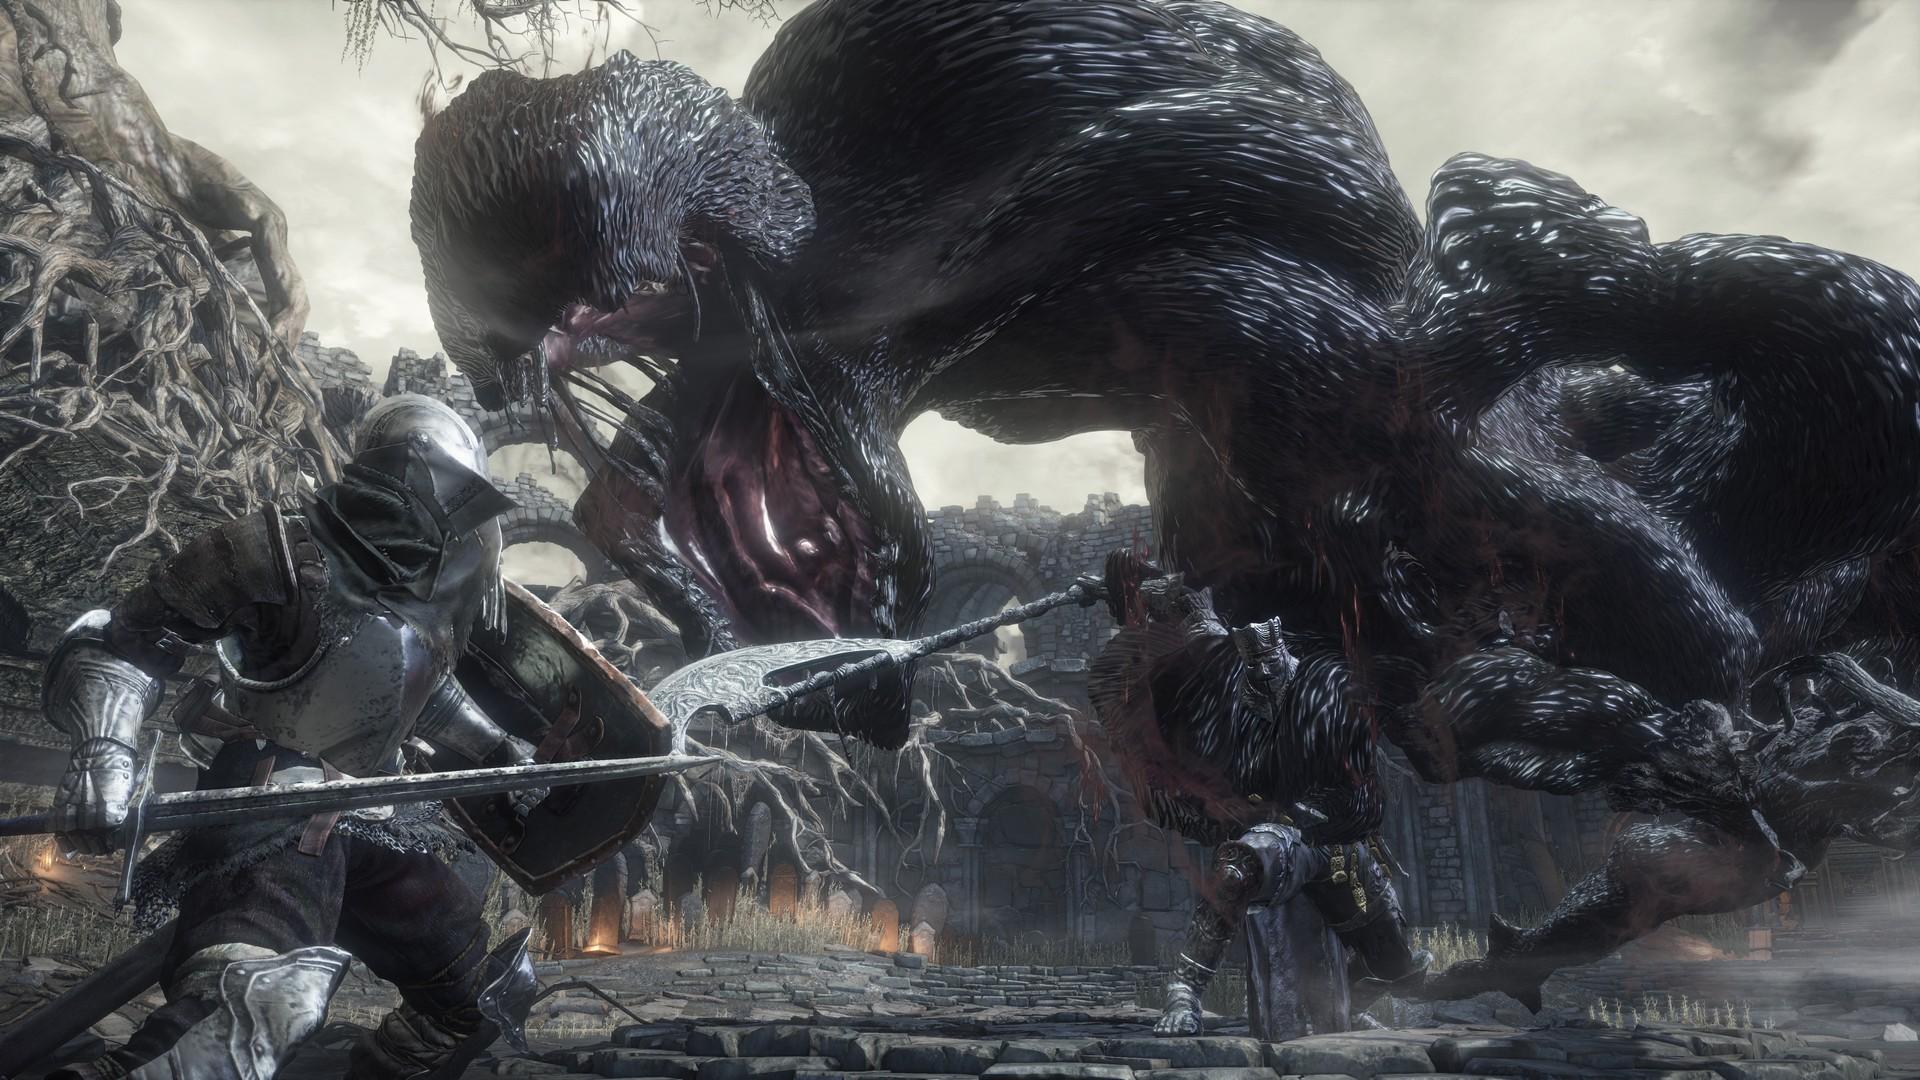 dark-souls-III-enemy-screenshot-1.jpg